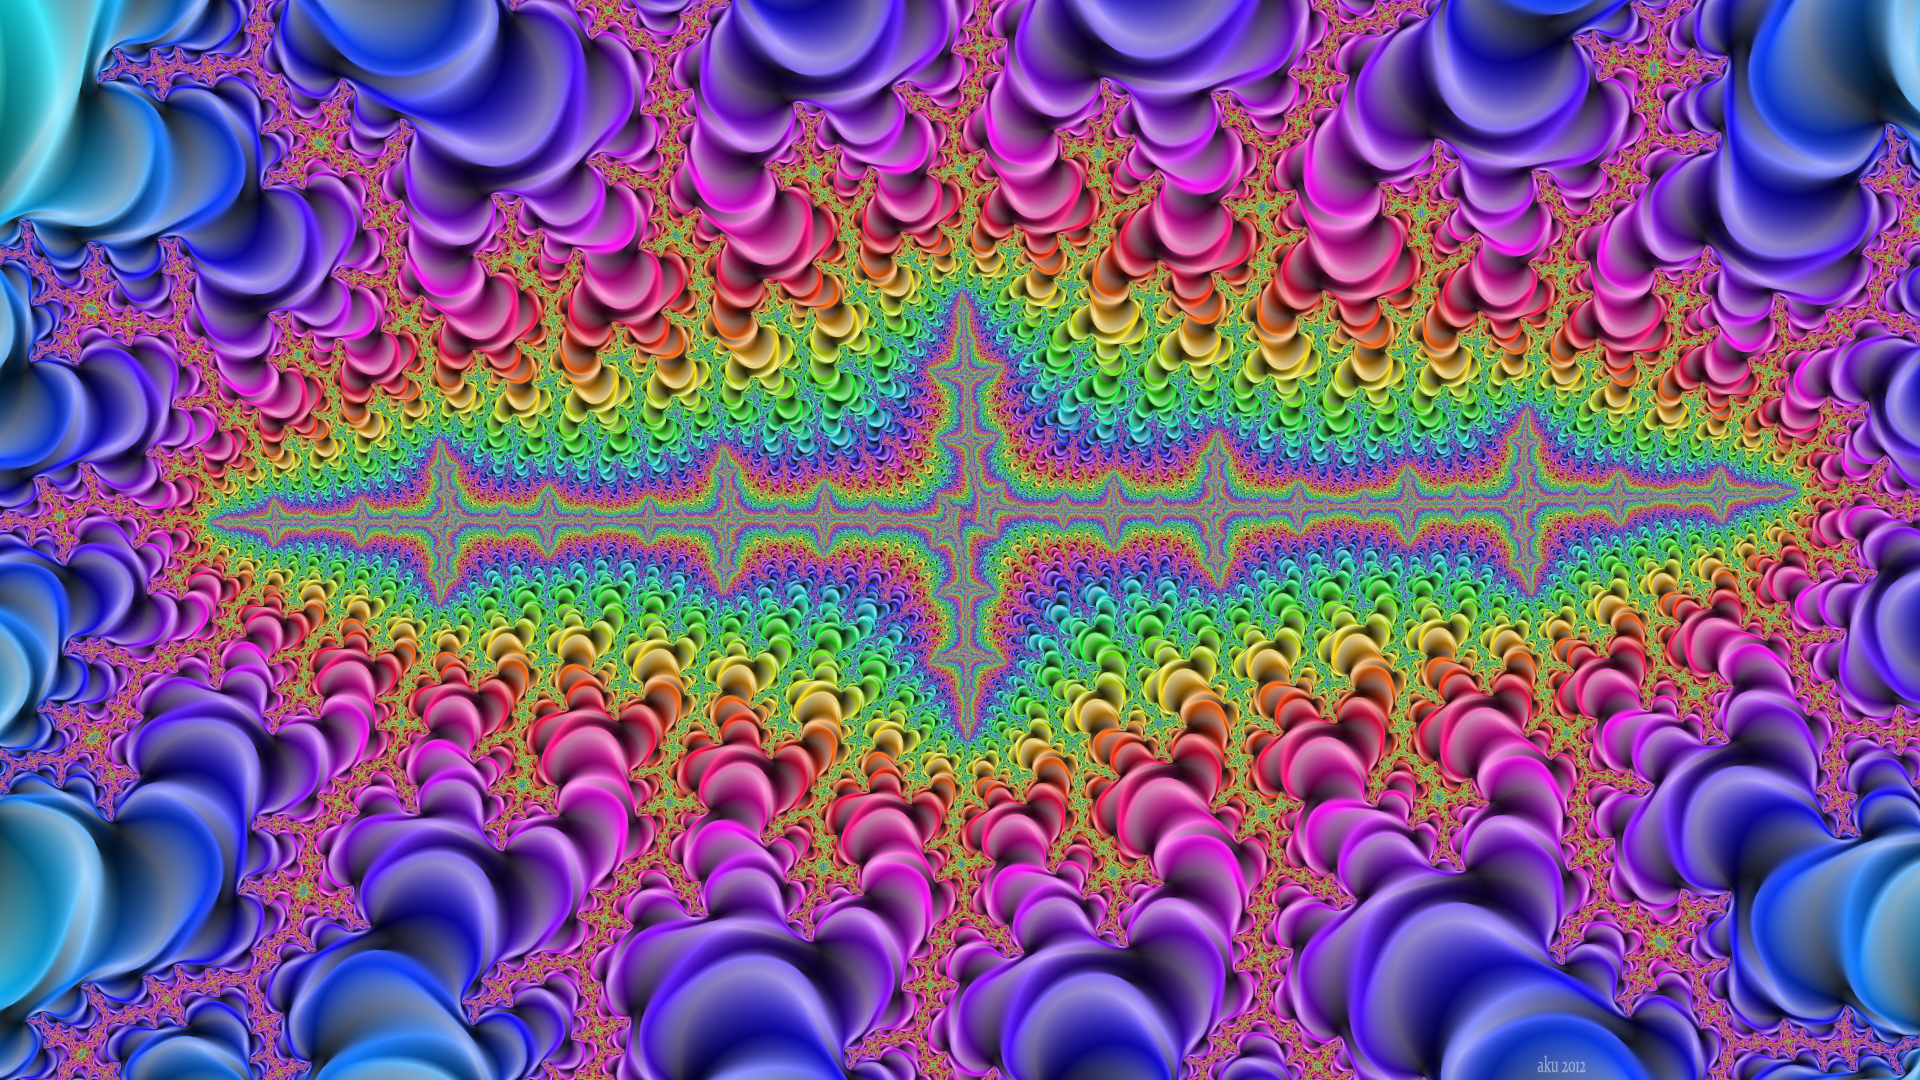 Psychedelic Computer Wallpapers Desktop Backgrounds 1920x1080